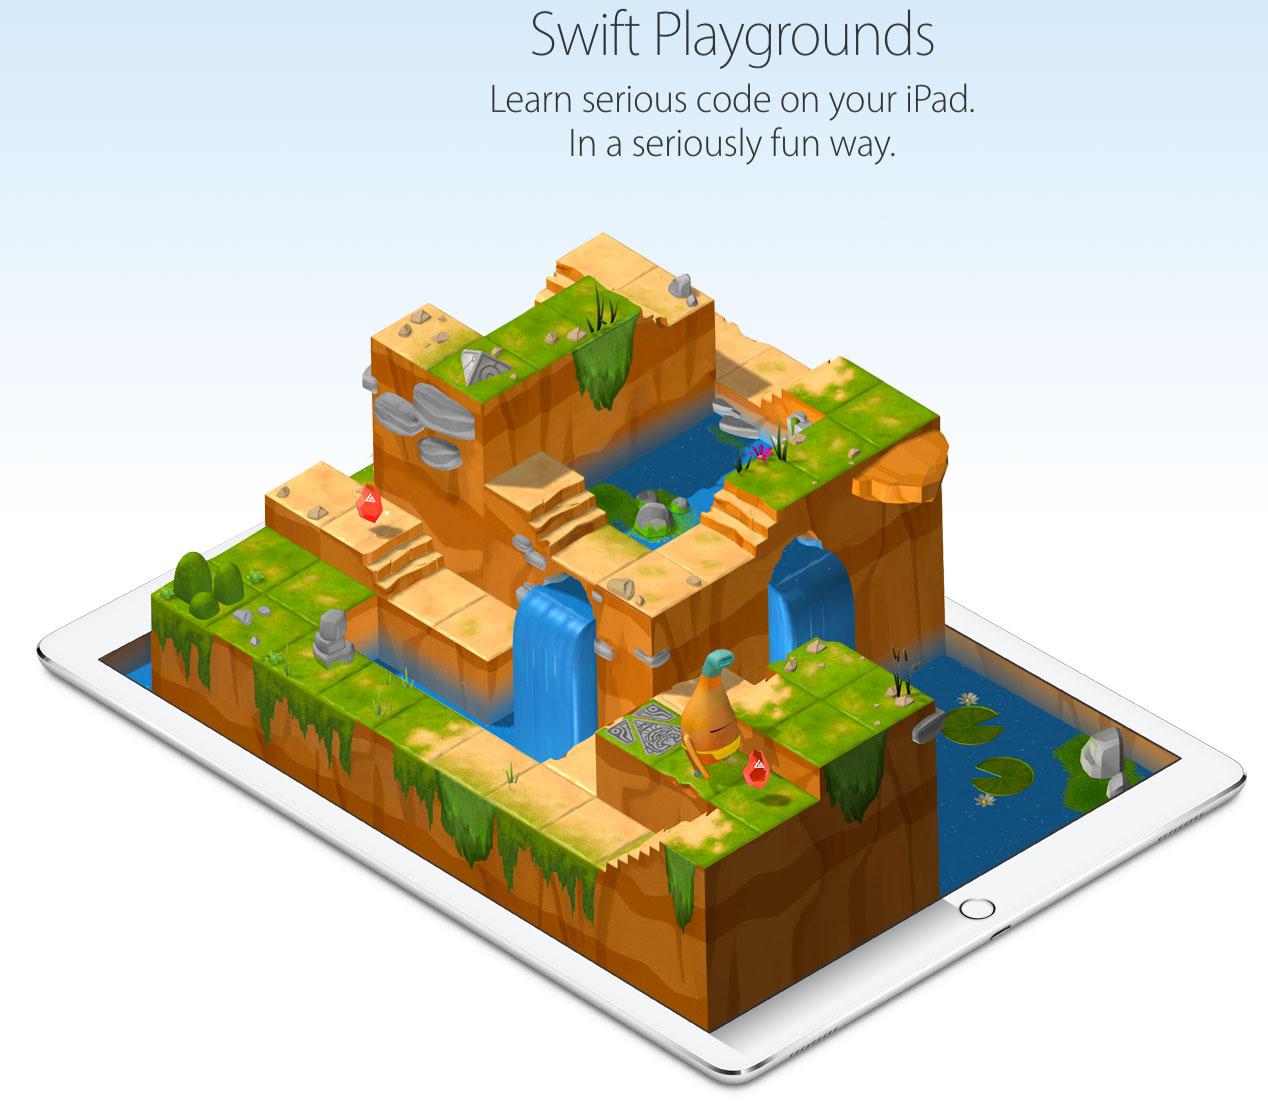 Swift Playgrounds